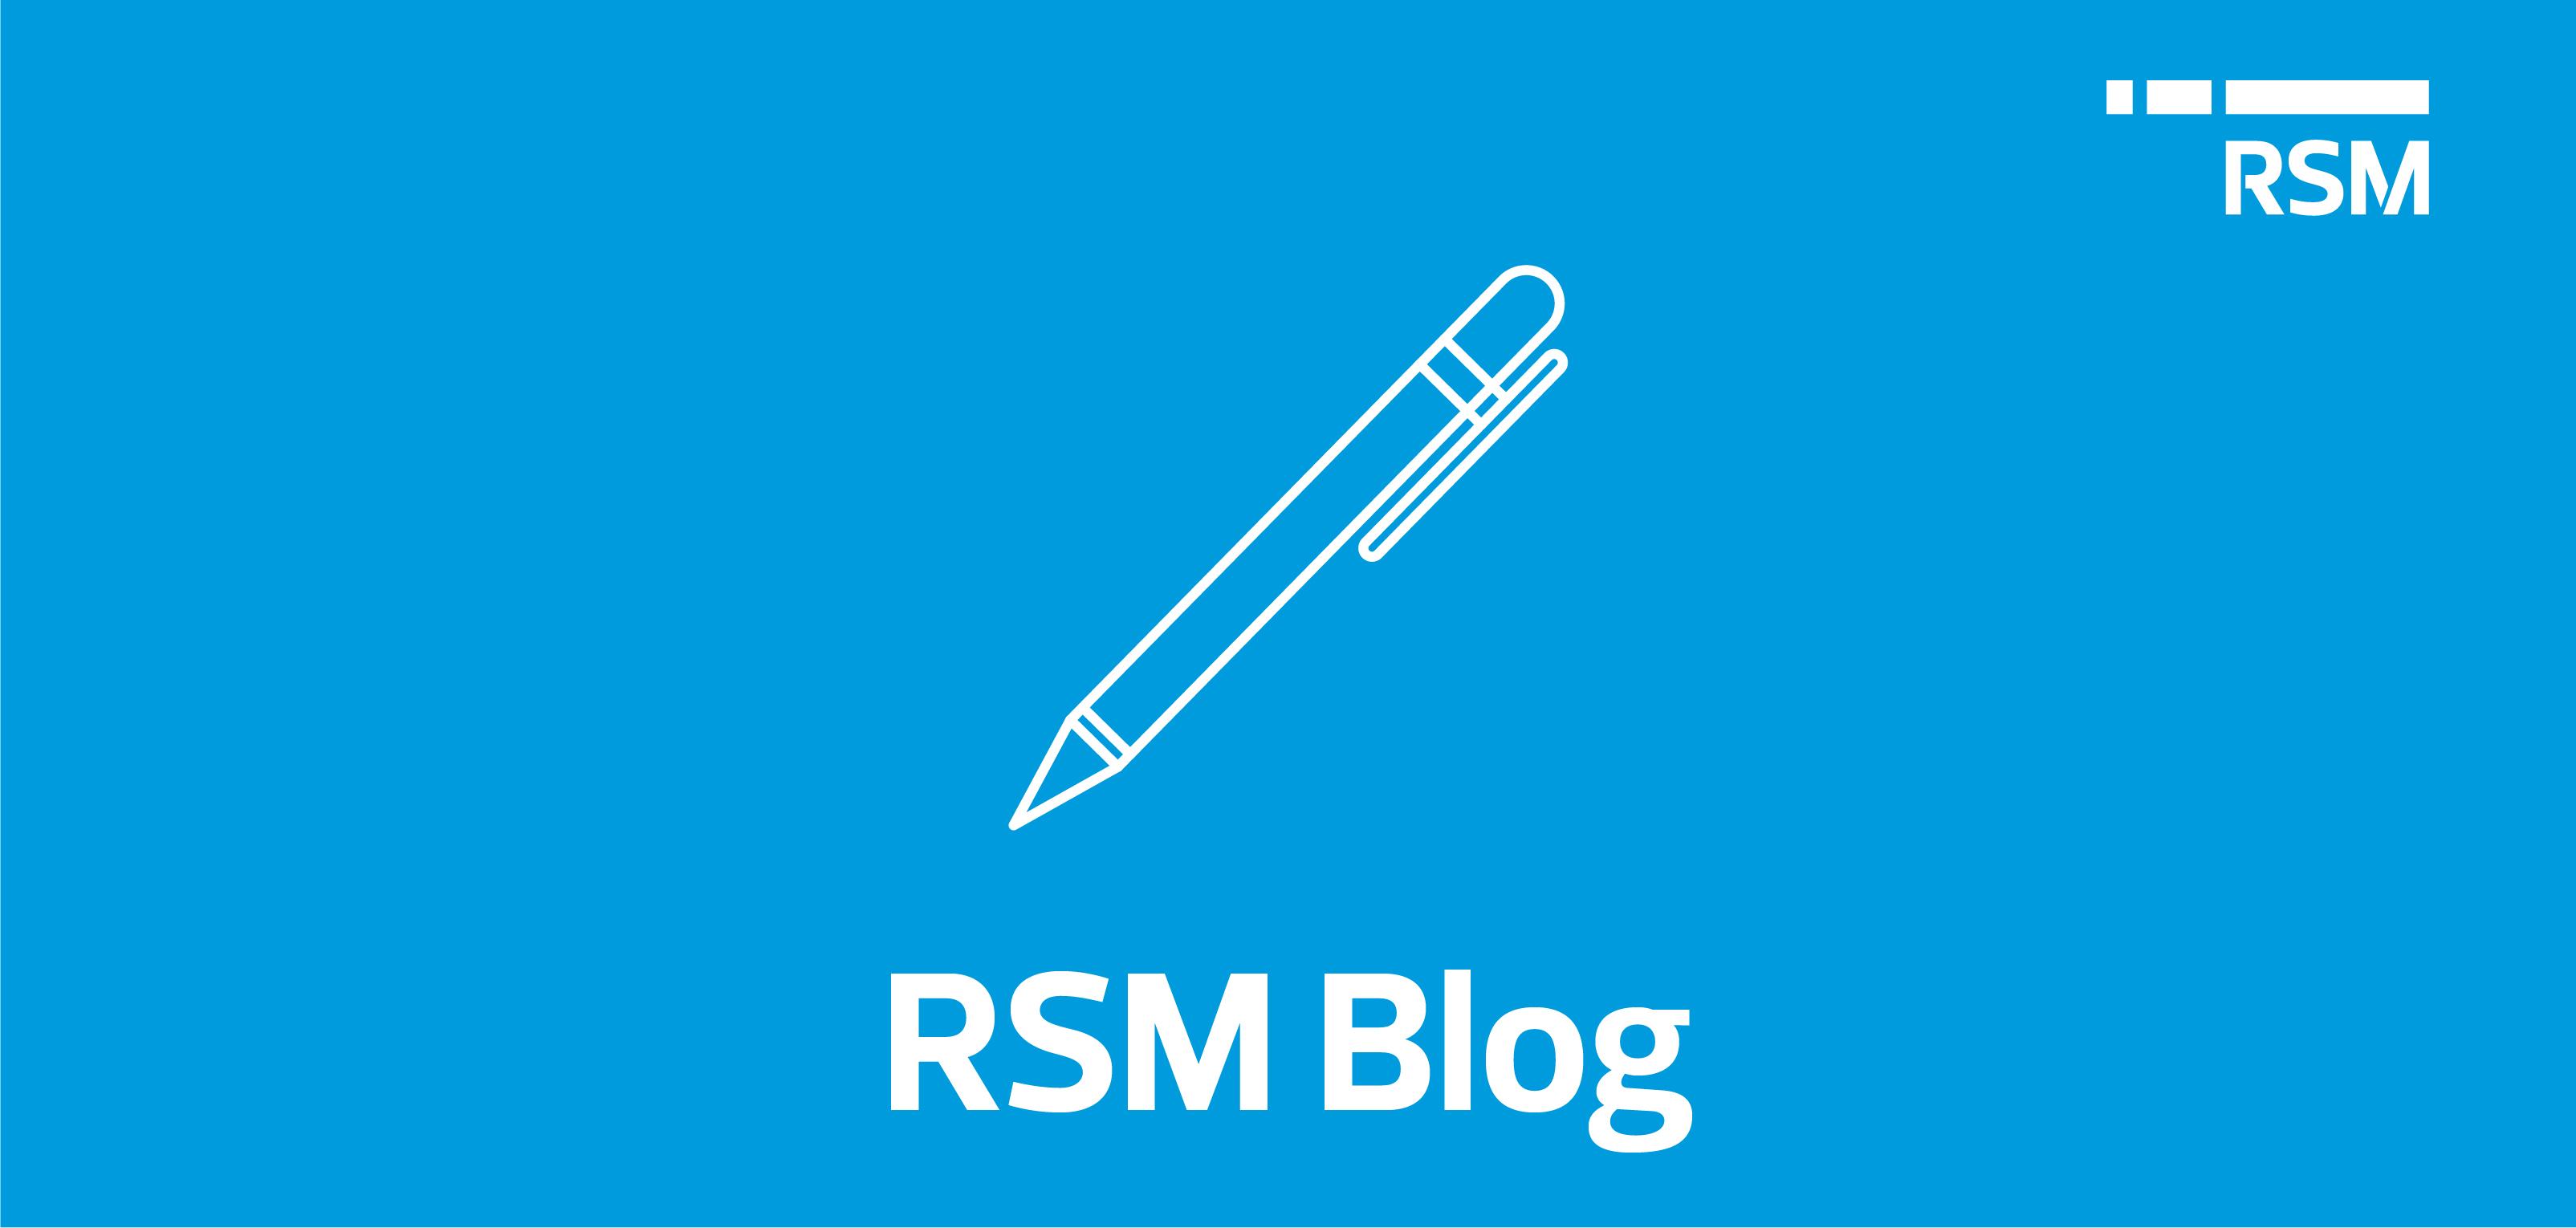 leasing zwrotny wg MSSF/IFRS 16